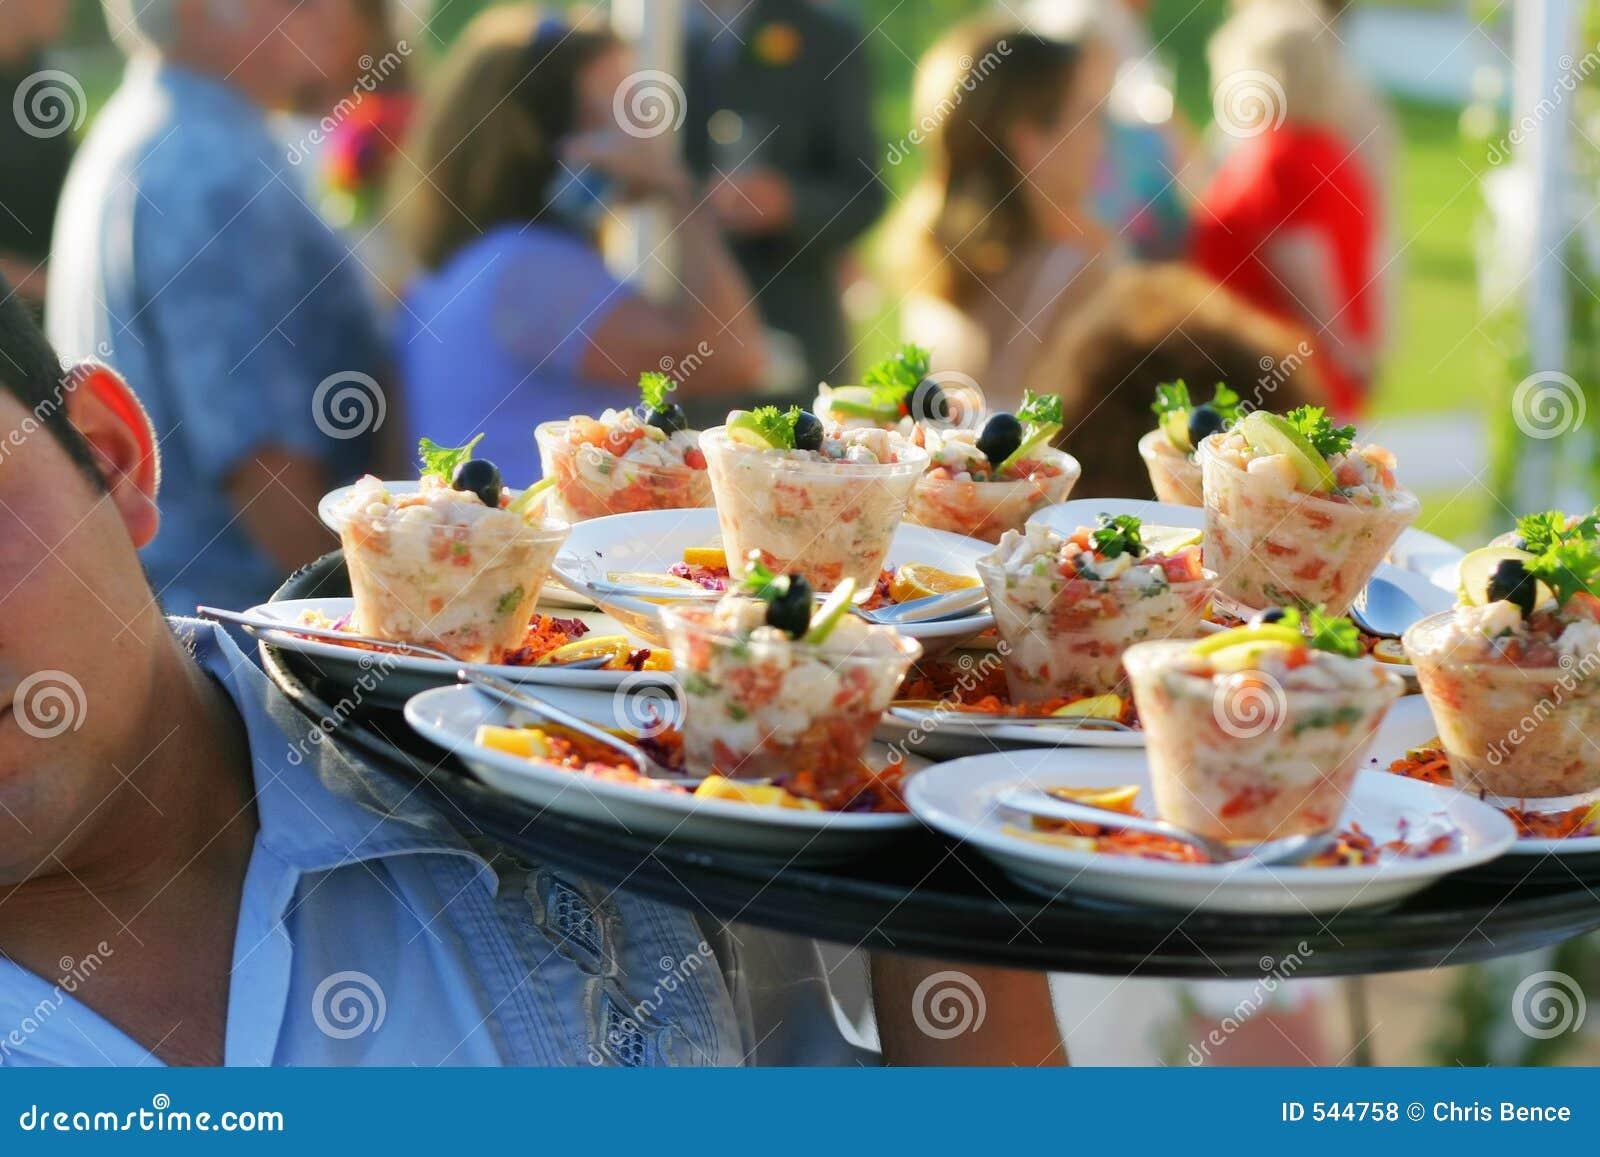 Download Ceviche 库存照片. 图片 包括有 正餐, 拉丁语, 快餐, 美味, 食物, 类似, 海鲜, 主厨, 时间 - 544758